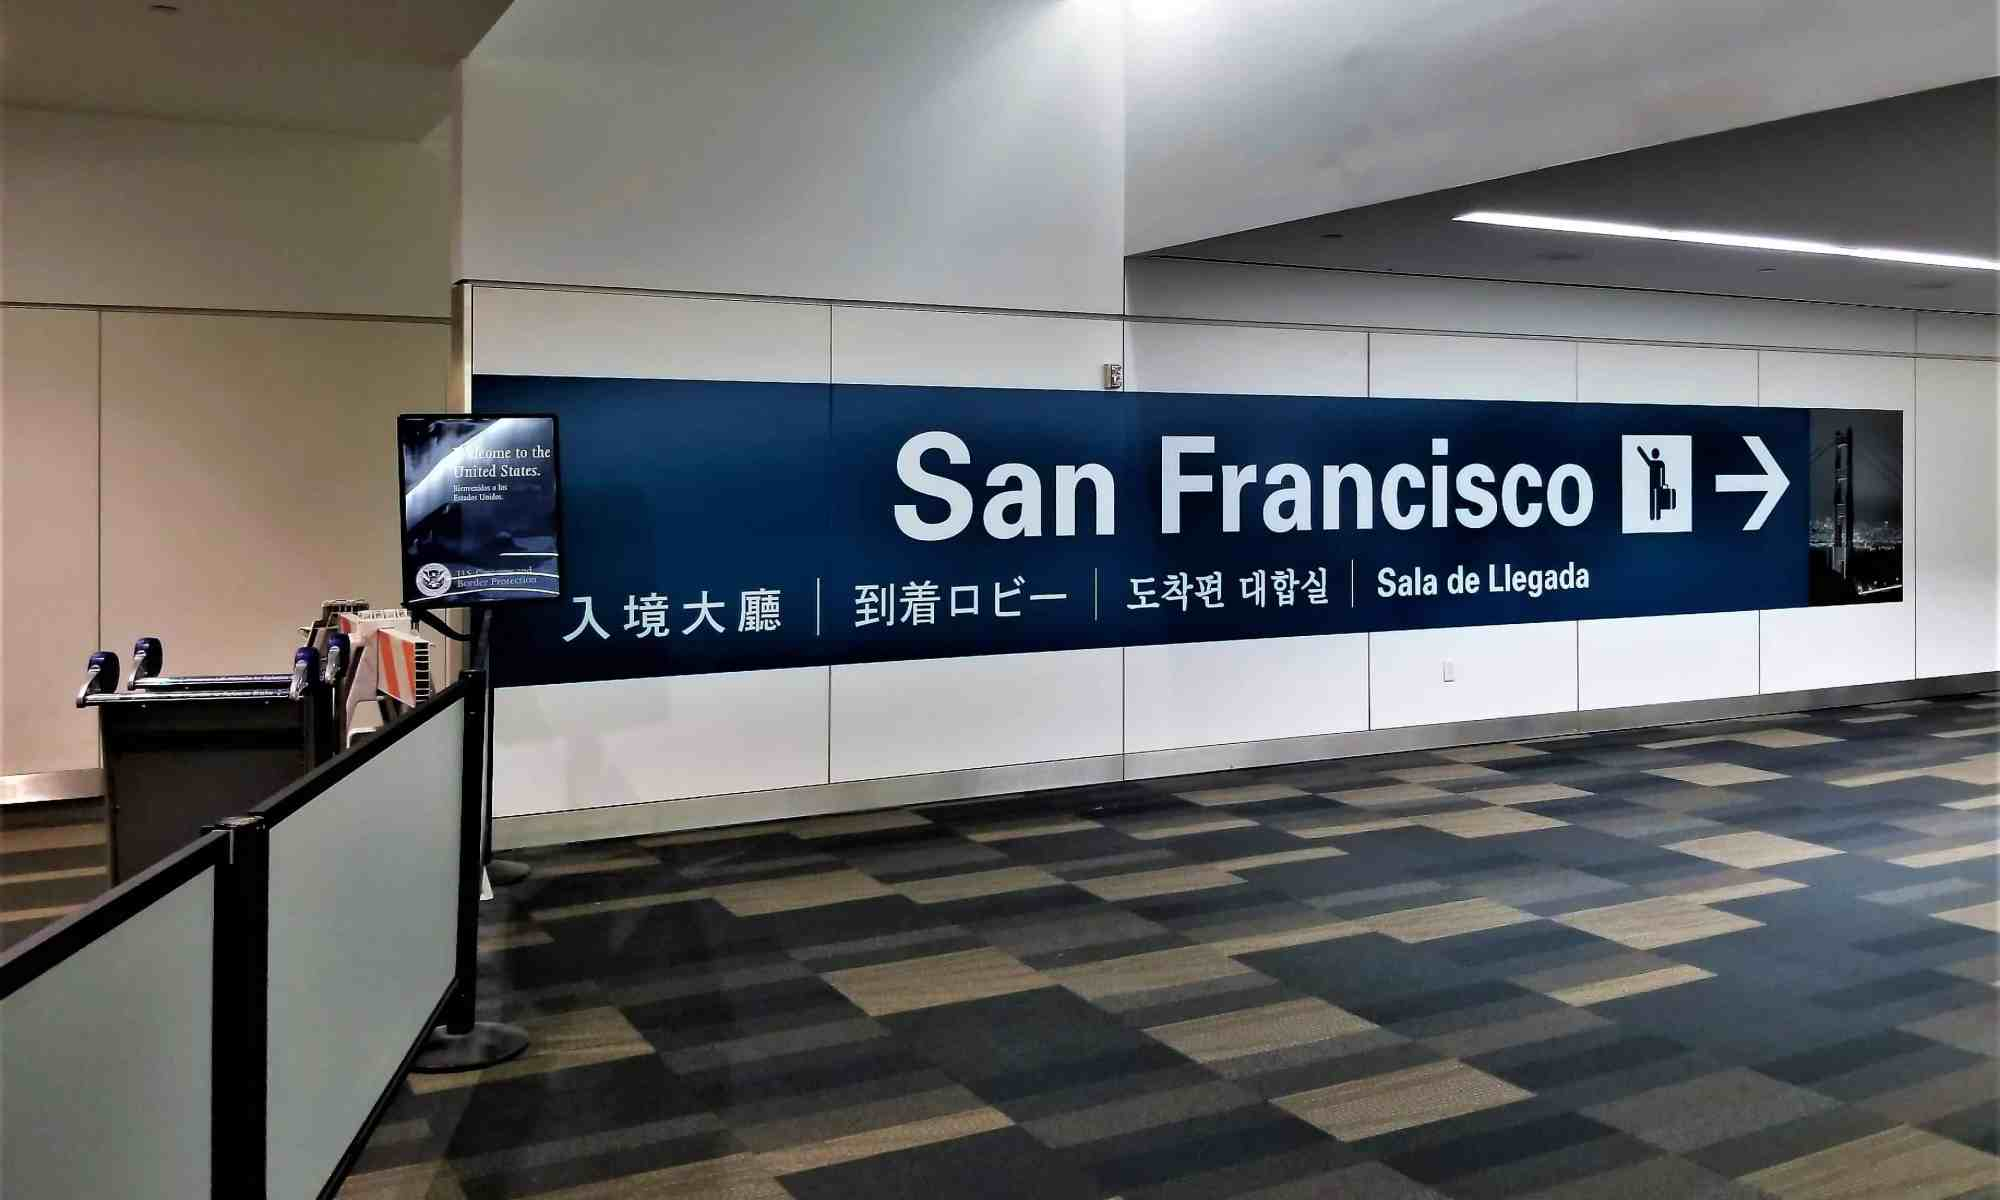 image-of-san-francisco-international-airport-terminal-exit